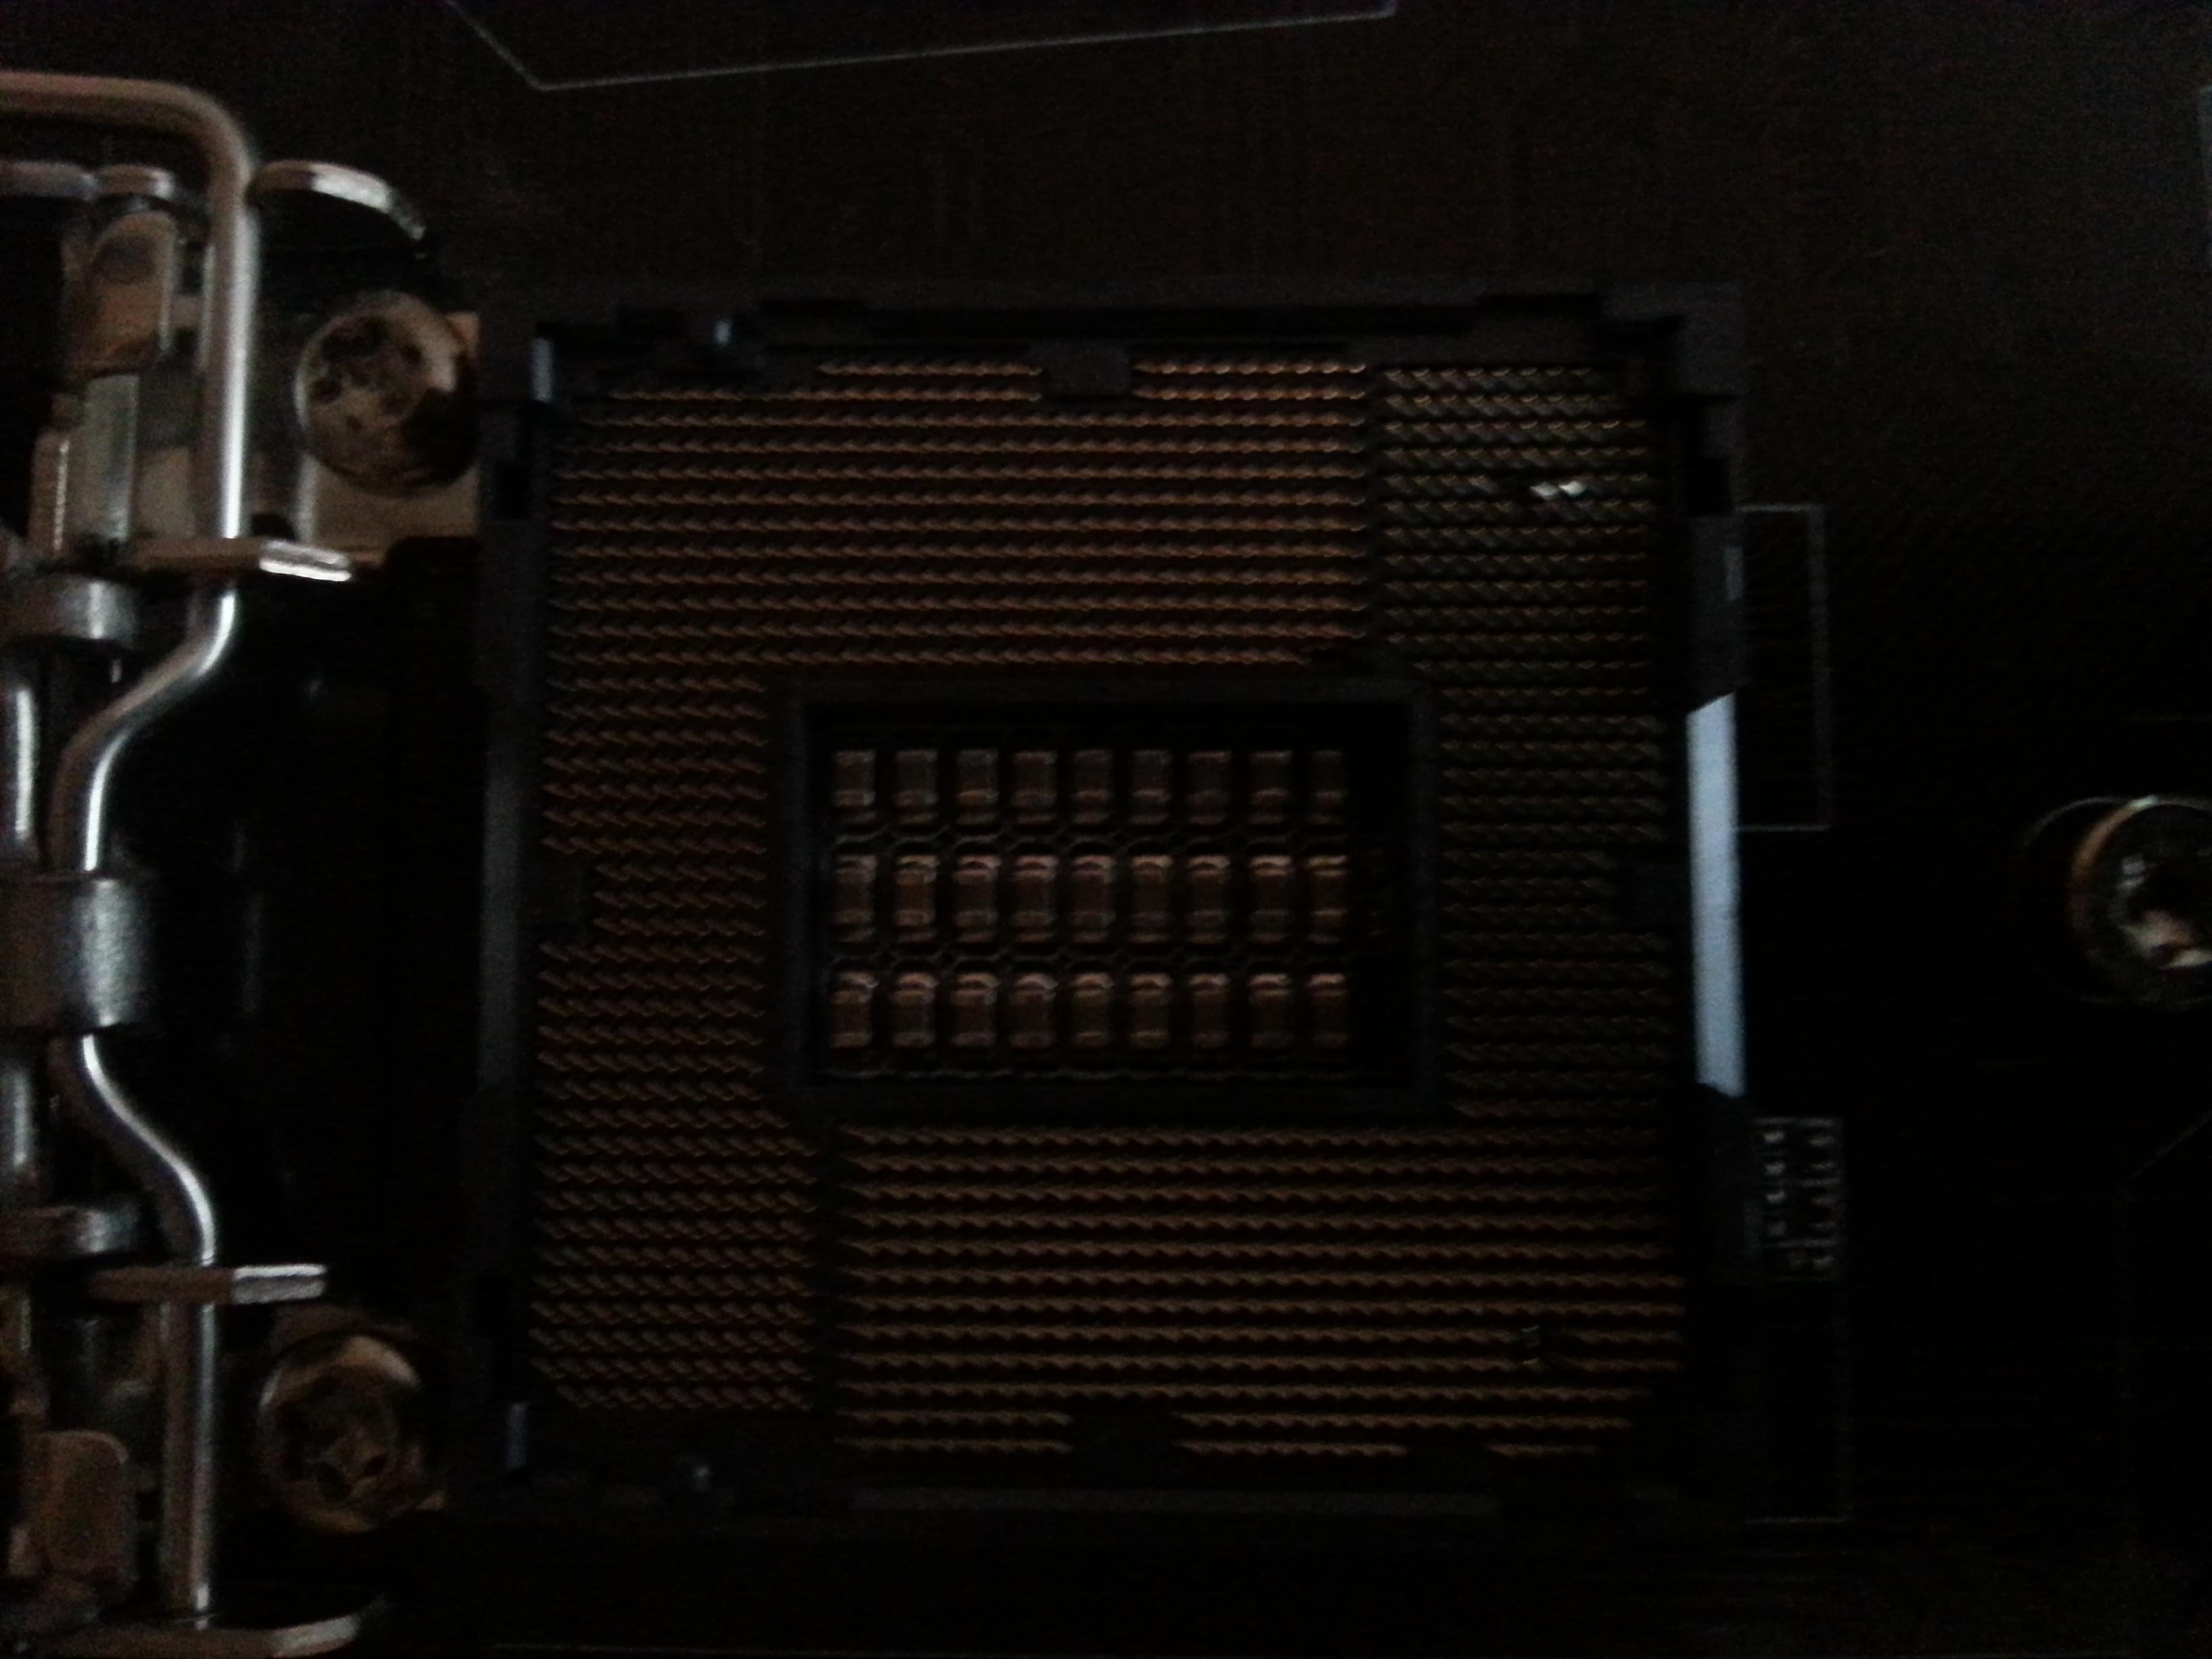 Gigabyte B85-HD3 - P�yta g��wna uszkodzone n�ki na podstawce